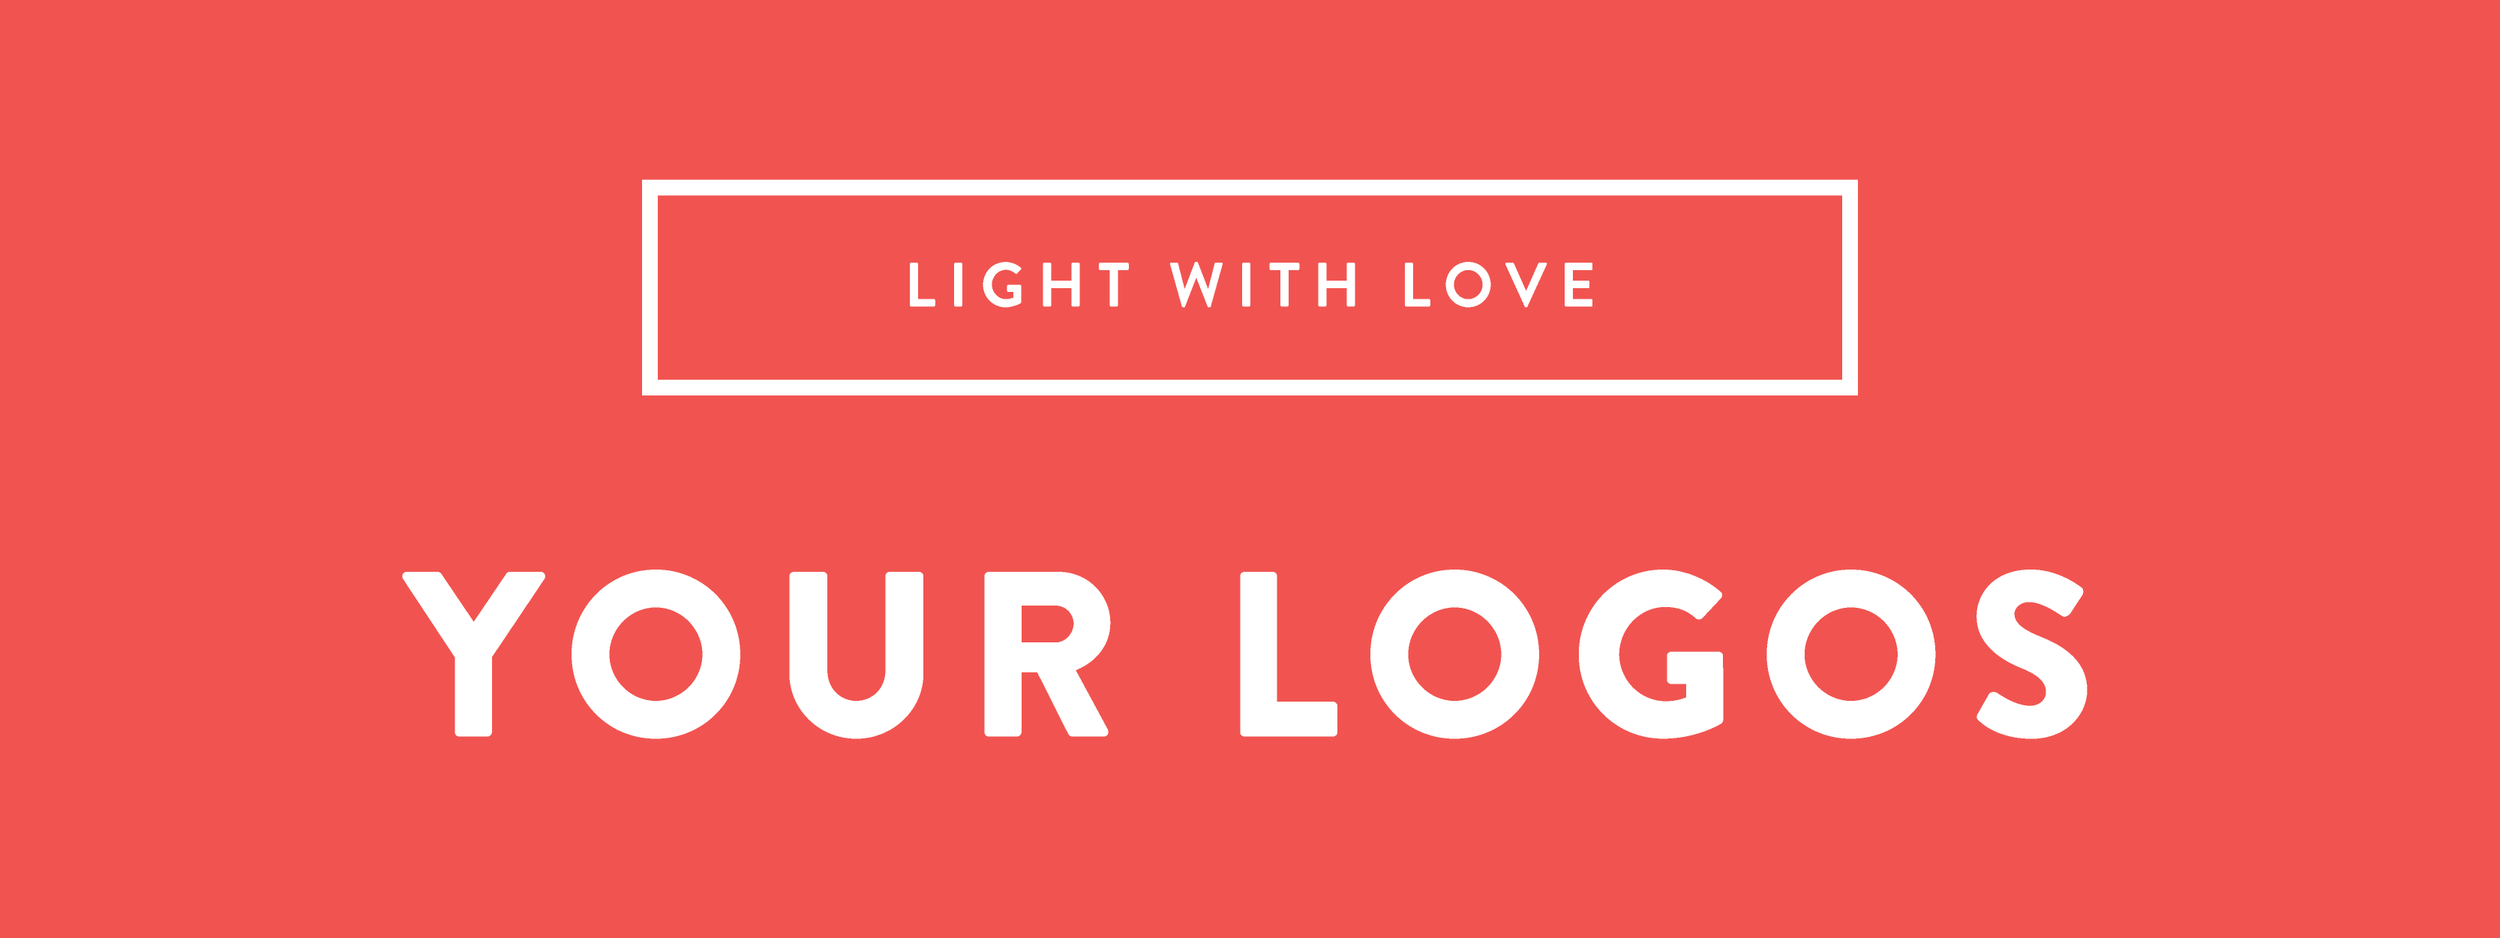 LWLP_Logo Header.png